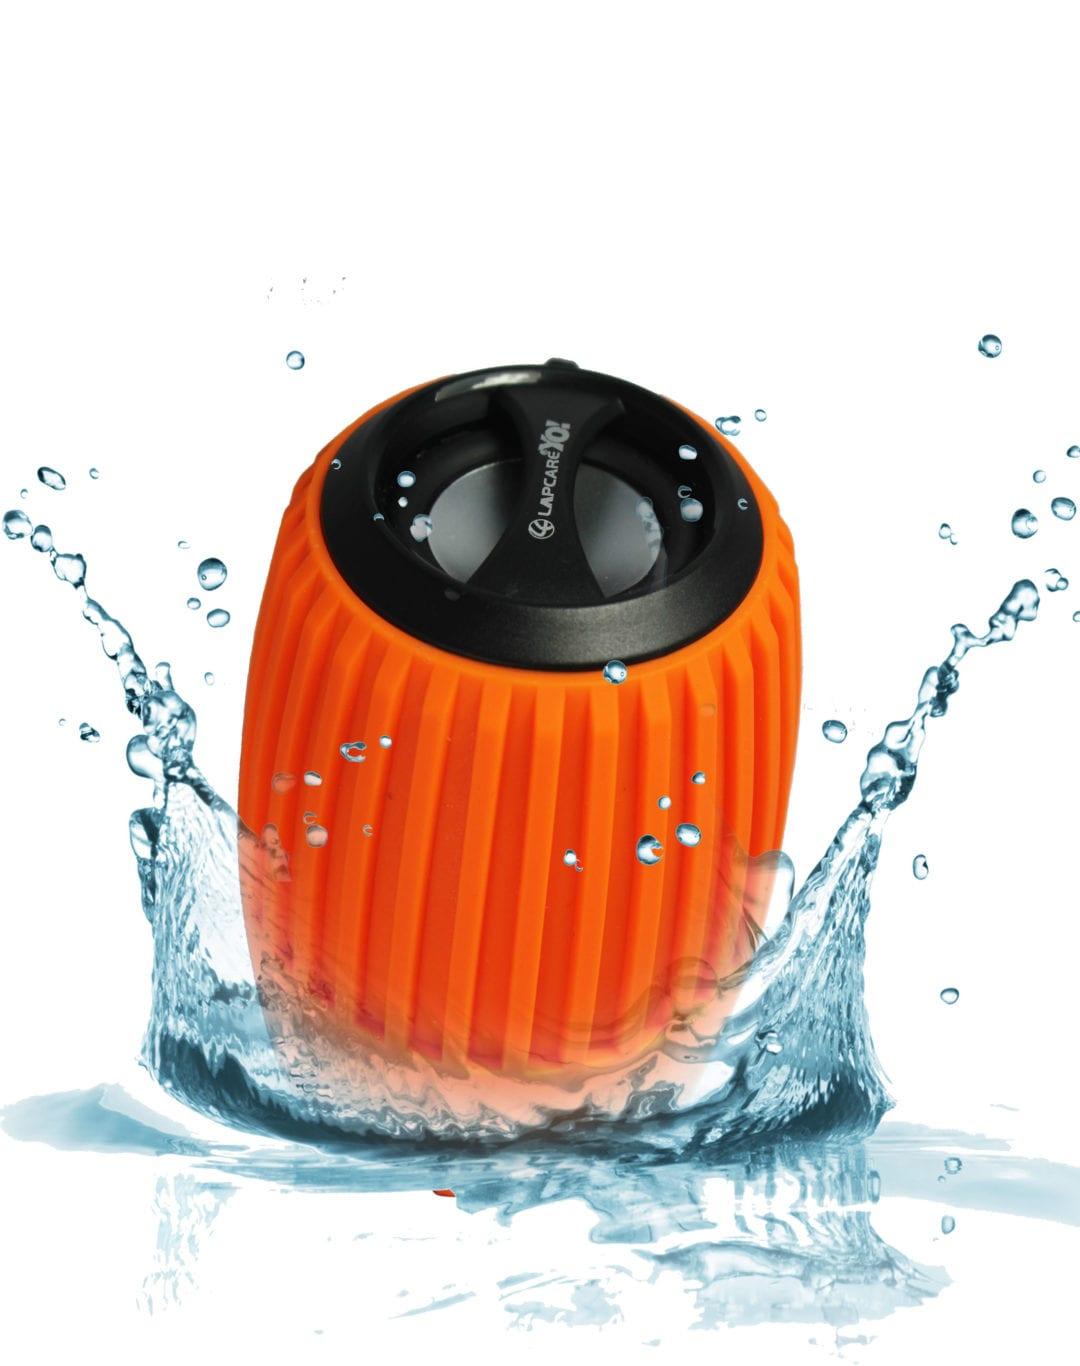 Lapcare YO LBS 333-water resistant bluetooth speaker